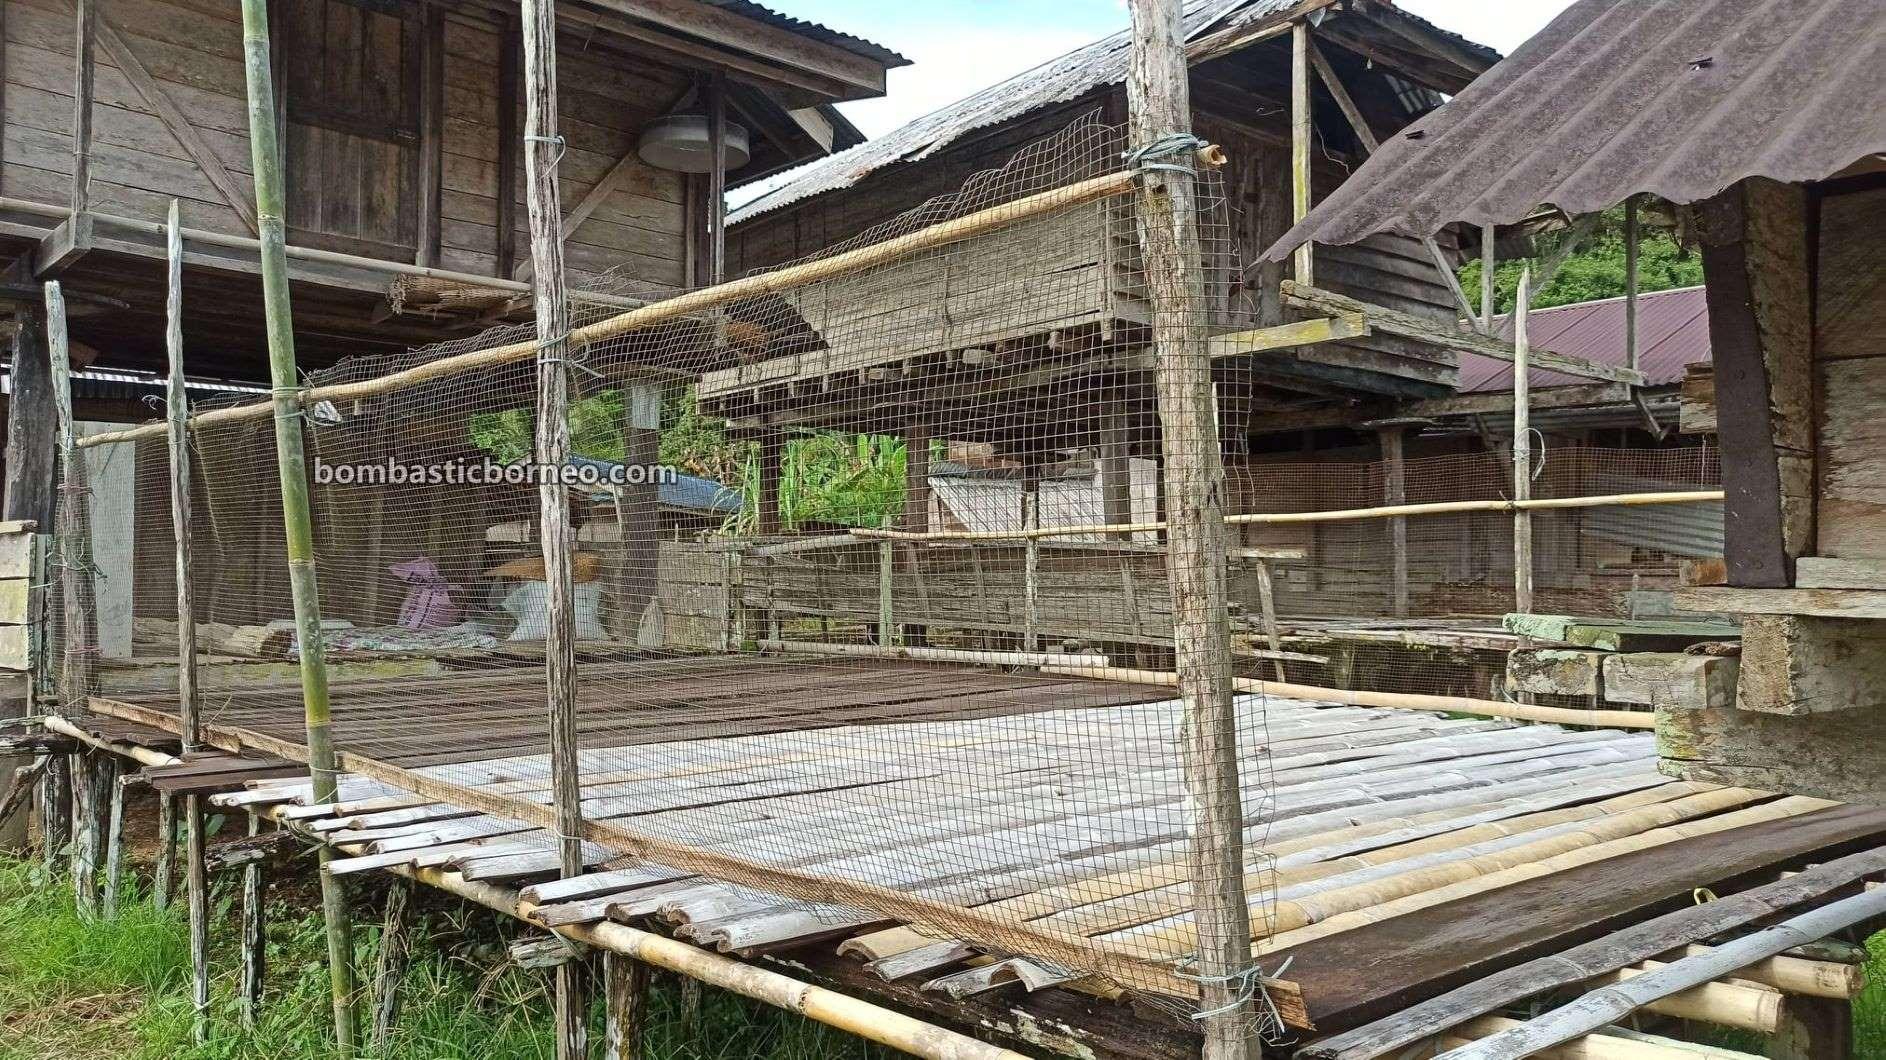 Village, hill paddy farming, paddy silo, authentic, native, Serian, Malaysia, Tourism, tourist attraction, travel guide, travel locally, Trans Borneo, 探索婆罗洲砂拉越, 马来西亚西连, 比达友传统文化